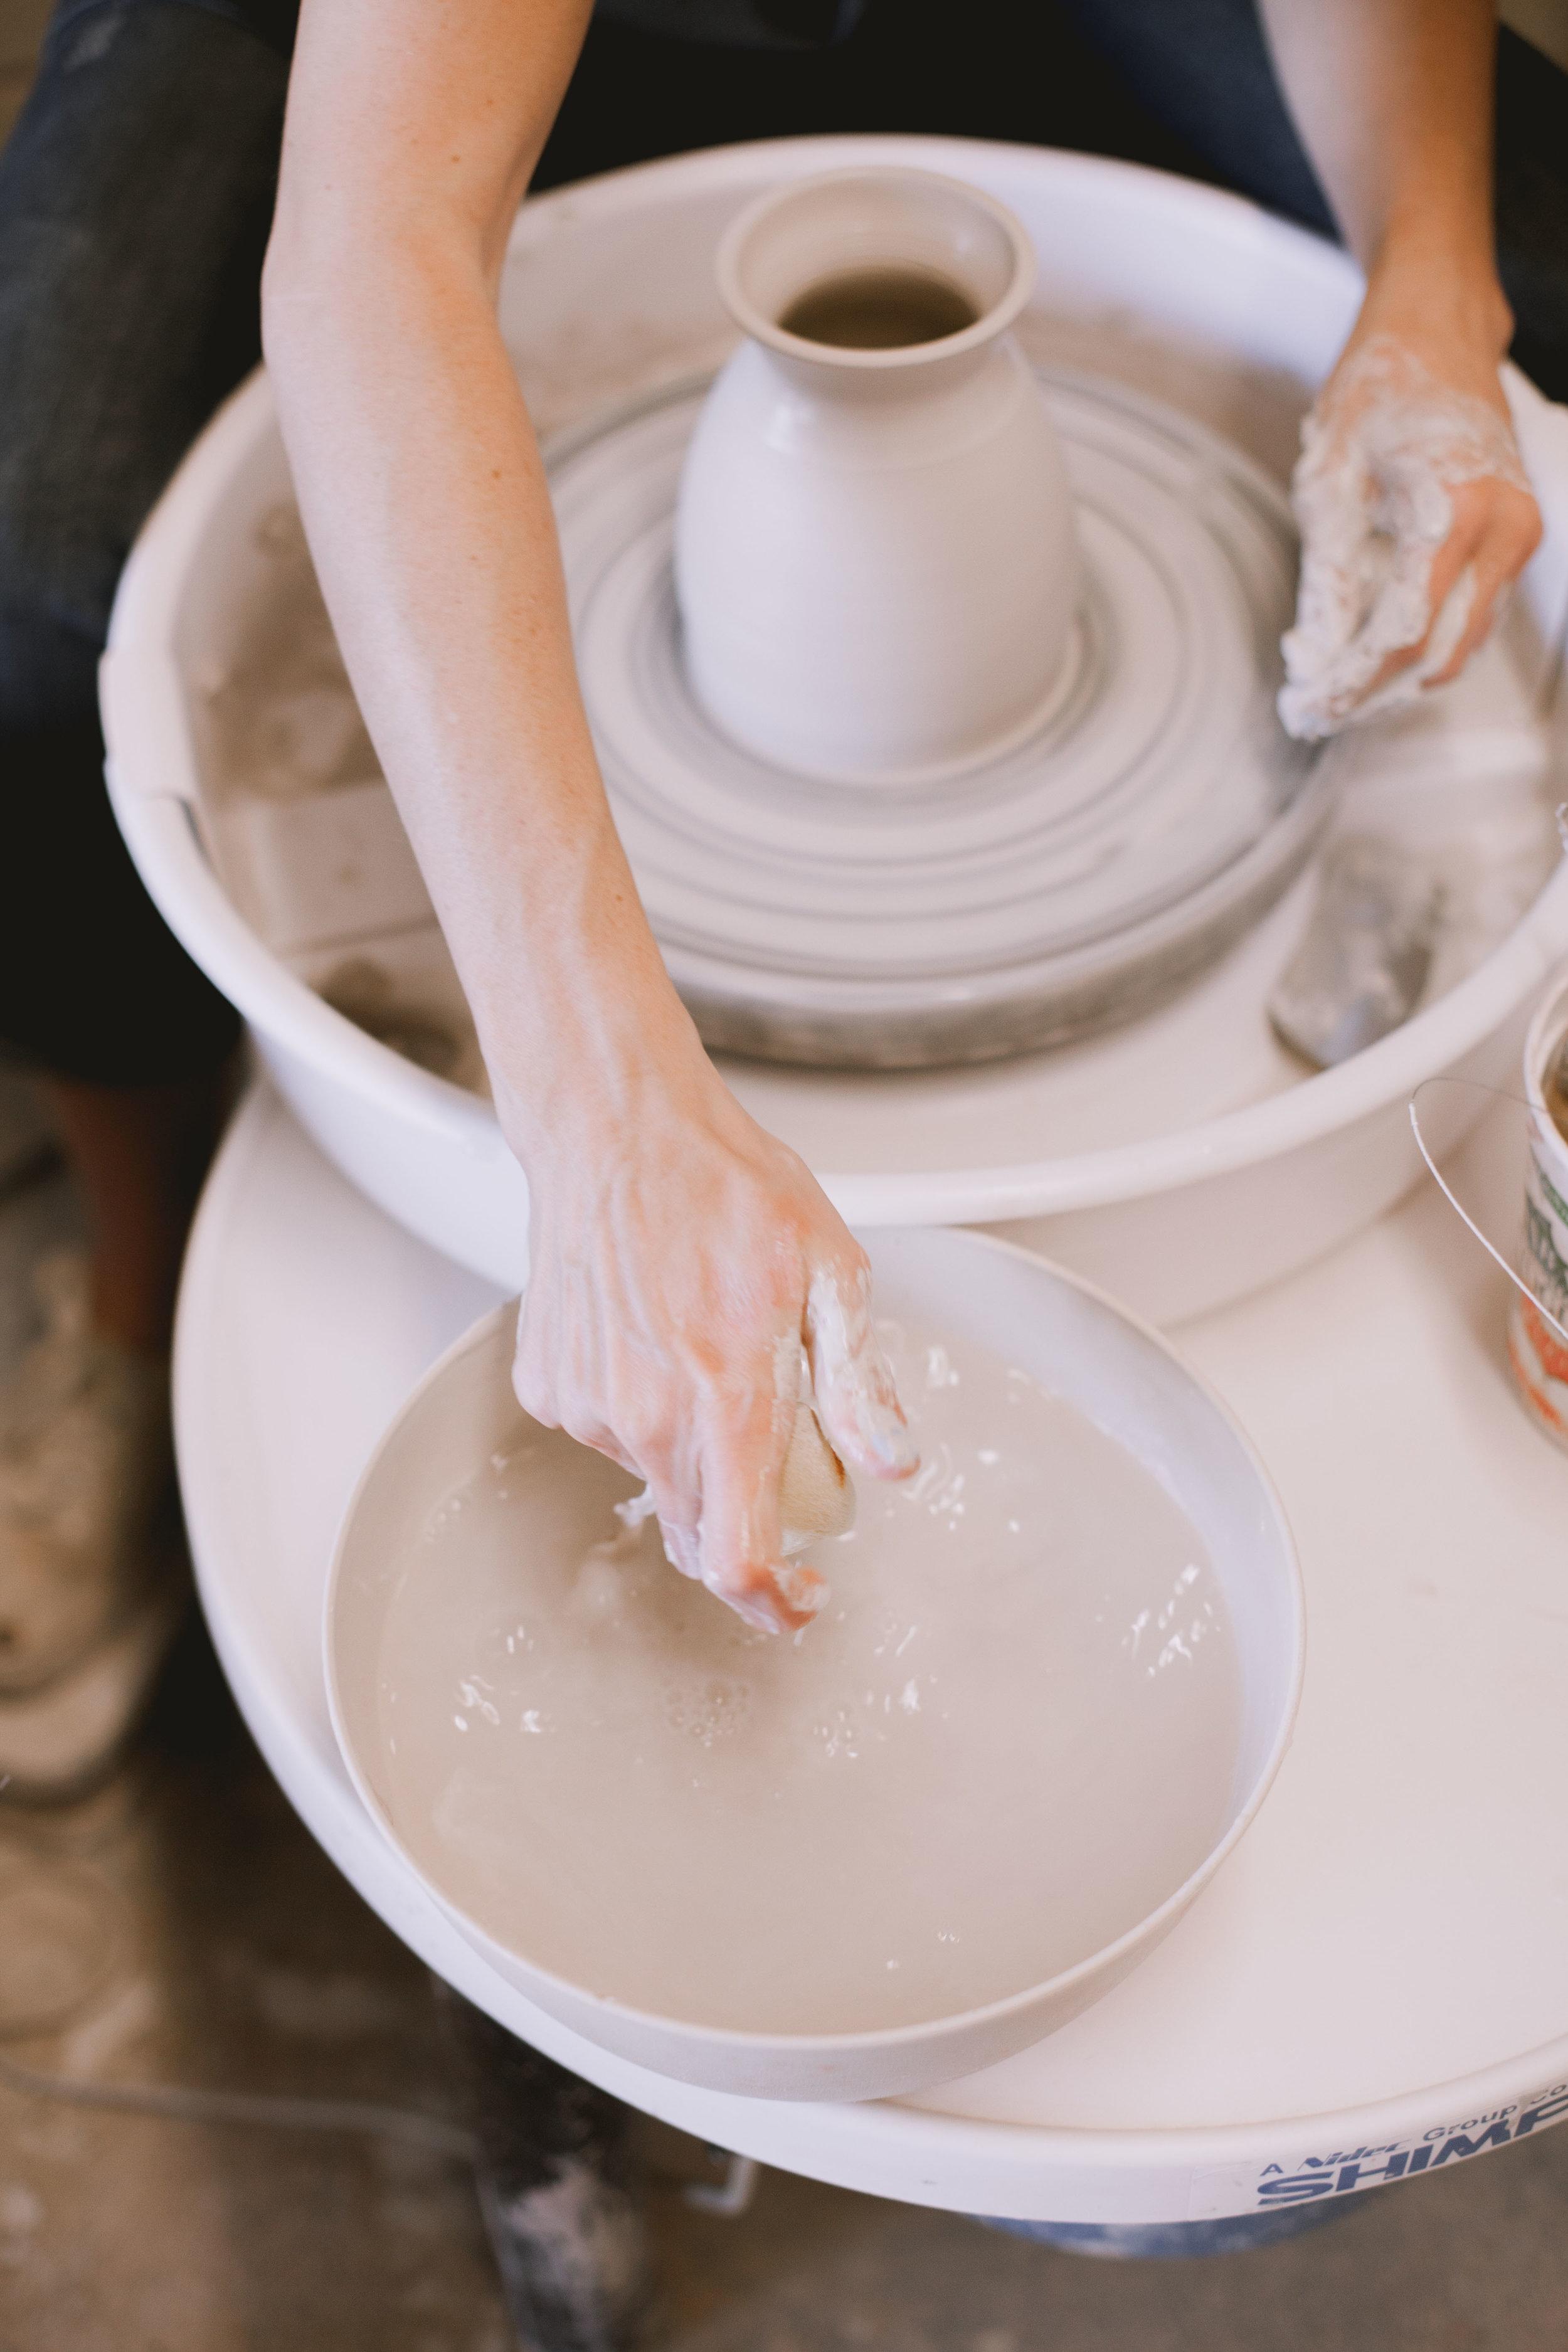 create-with-gusto-branding-san-diego-photography-handmade-artisan-isiko-018.jpg